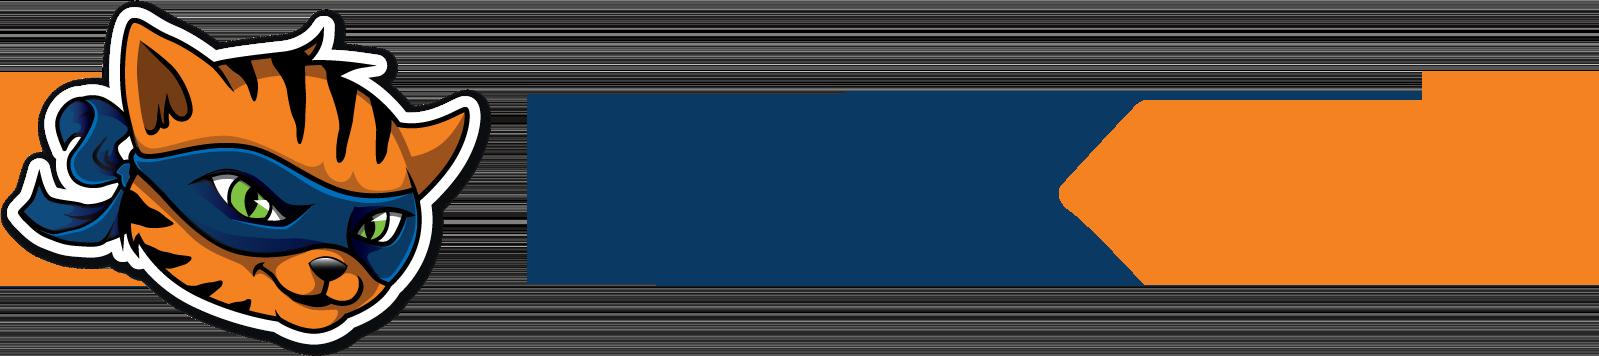 Katacoda, o cómo aprender sin aburrirse.